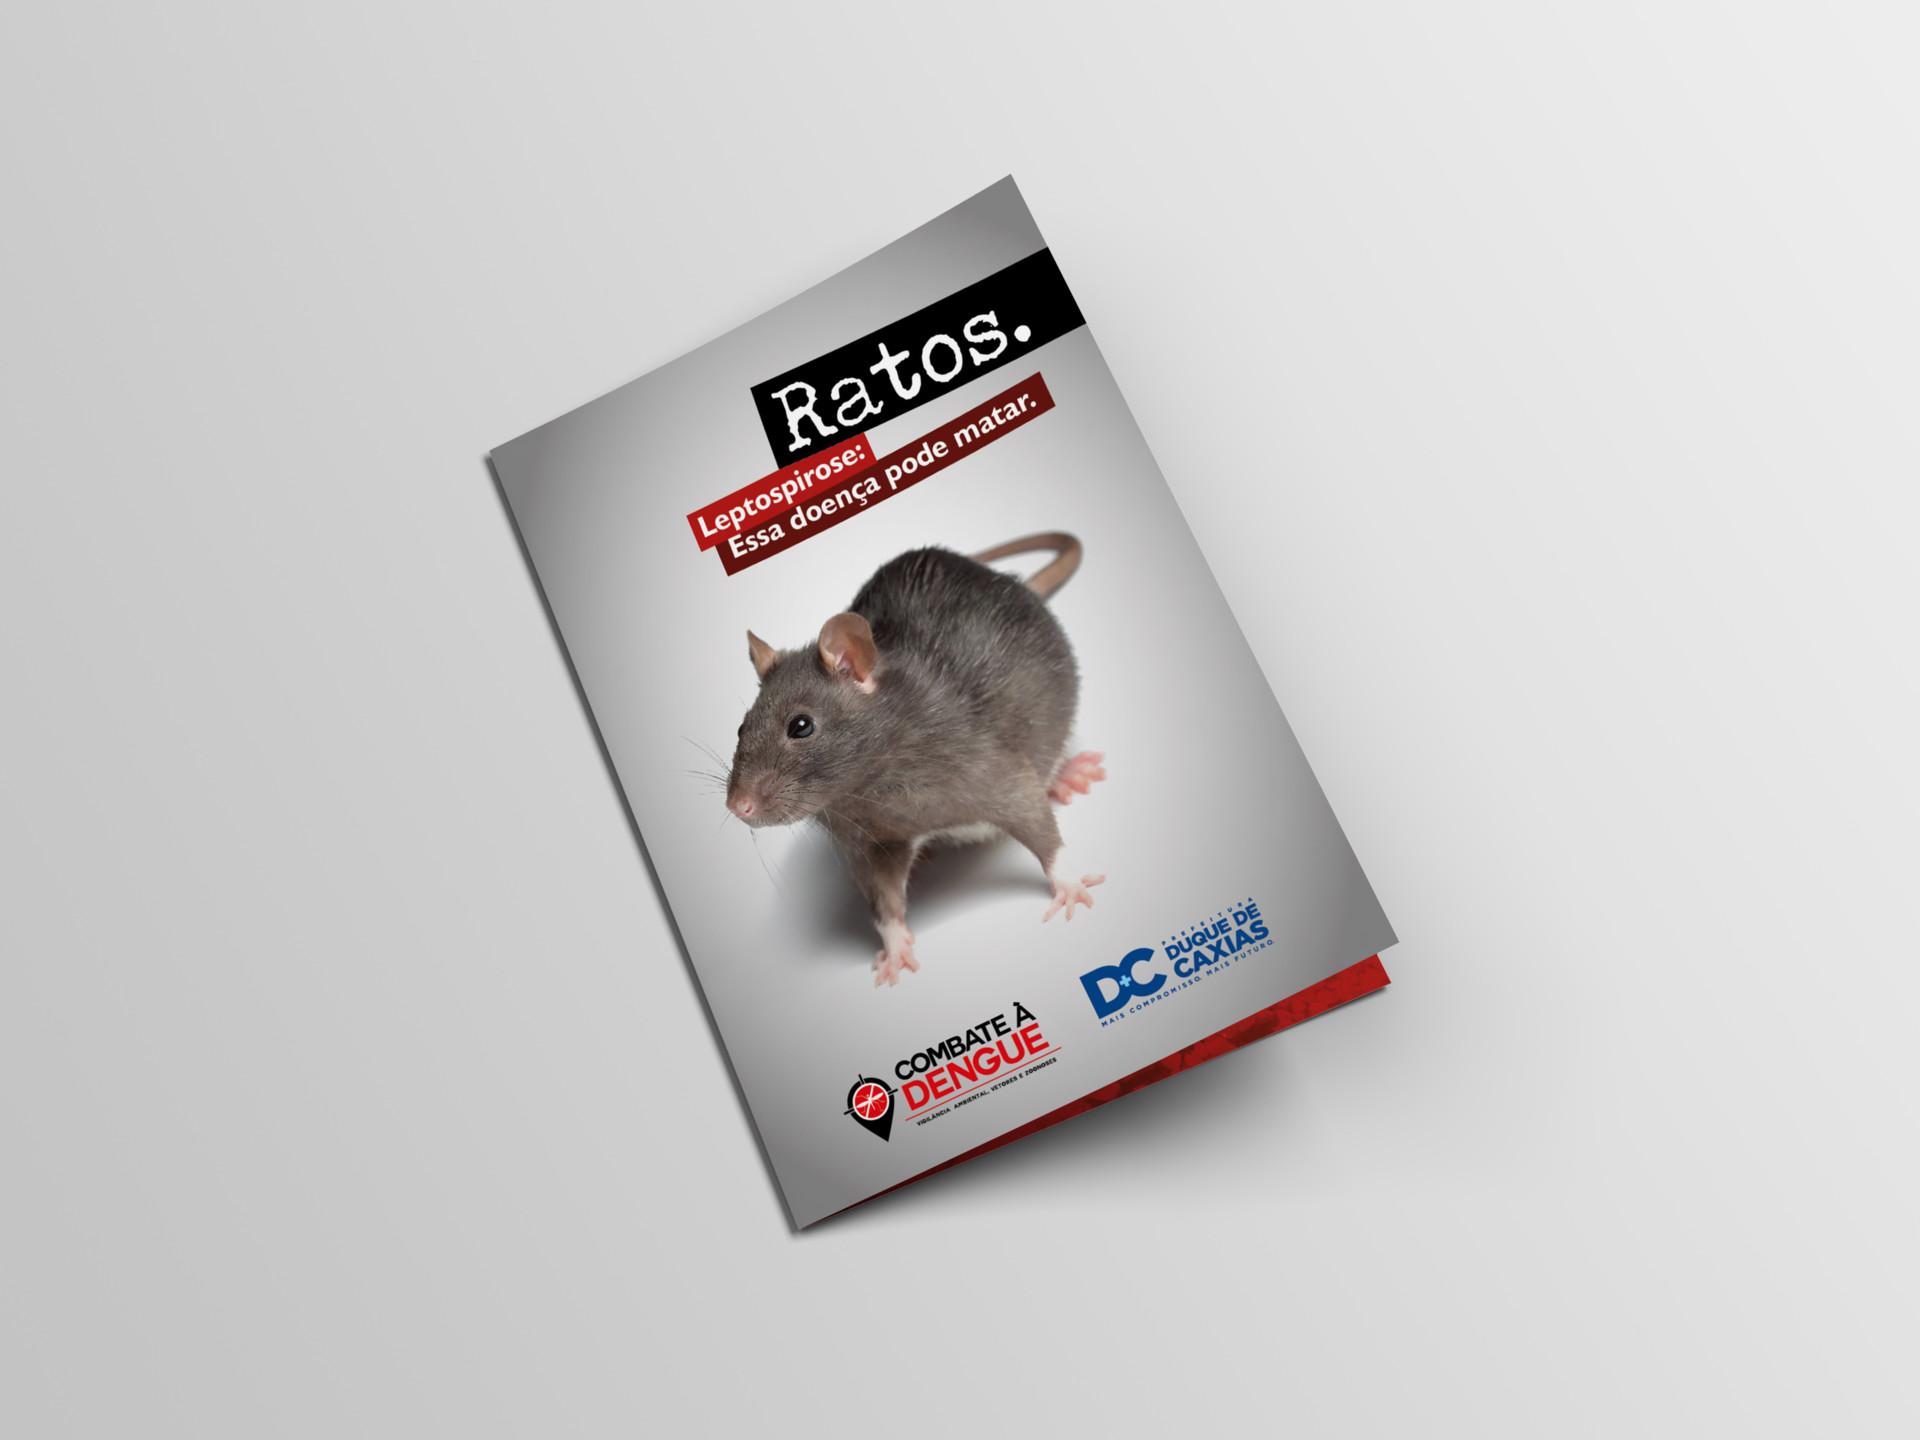 Leandro calazans folder rato